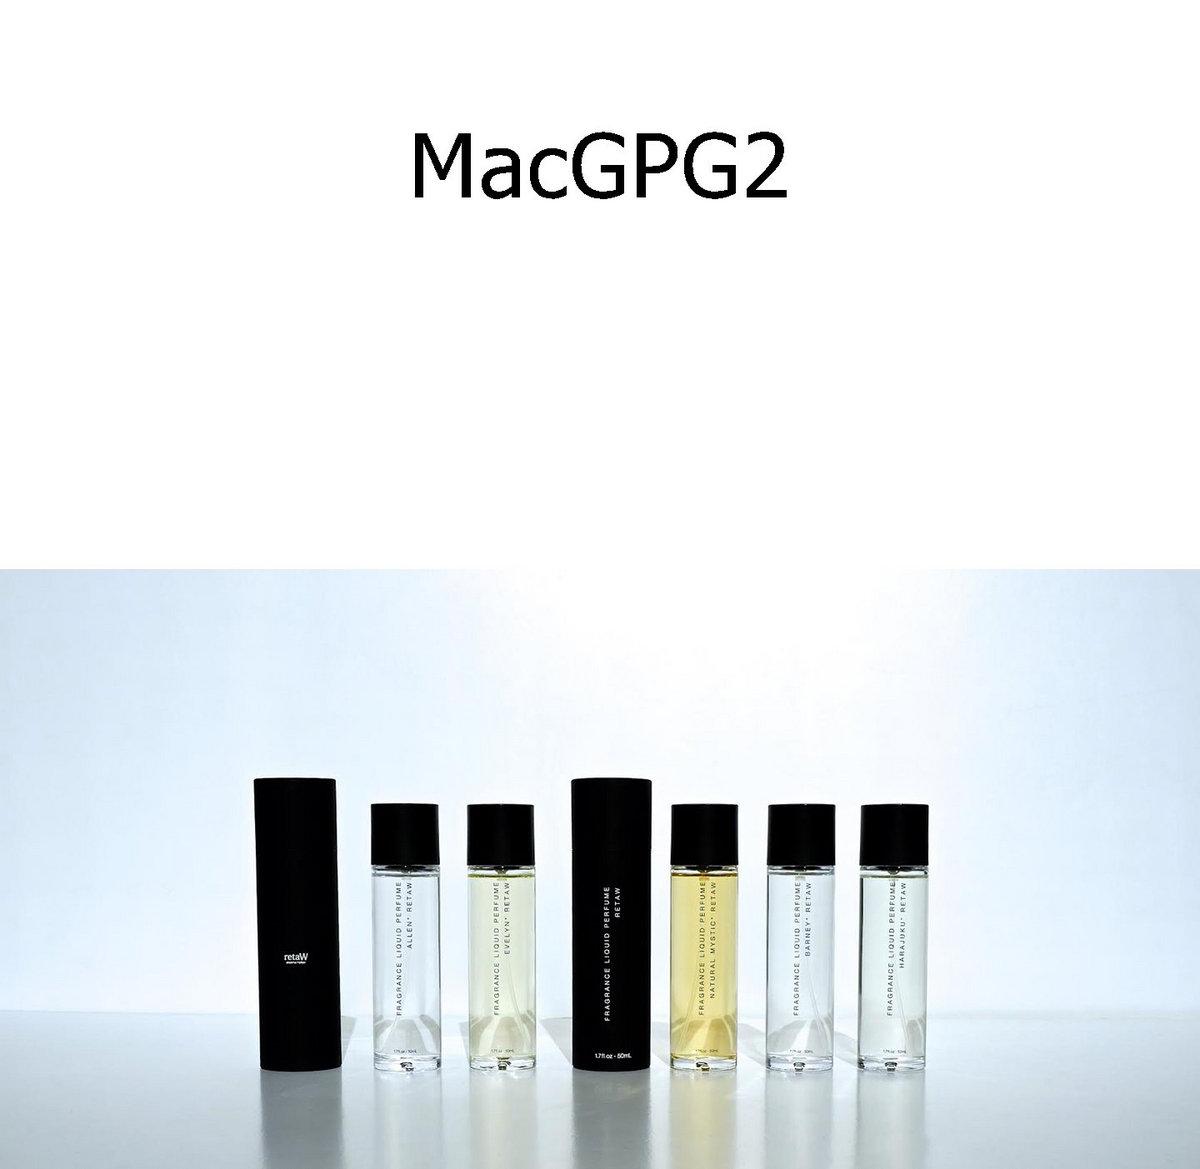 macgpg2